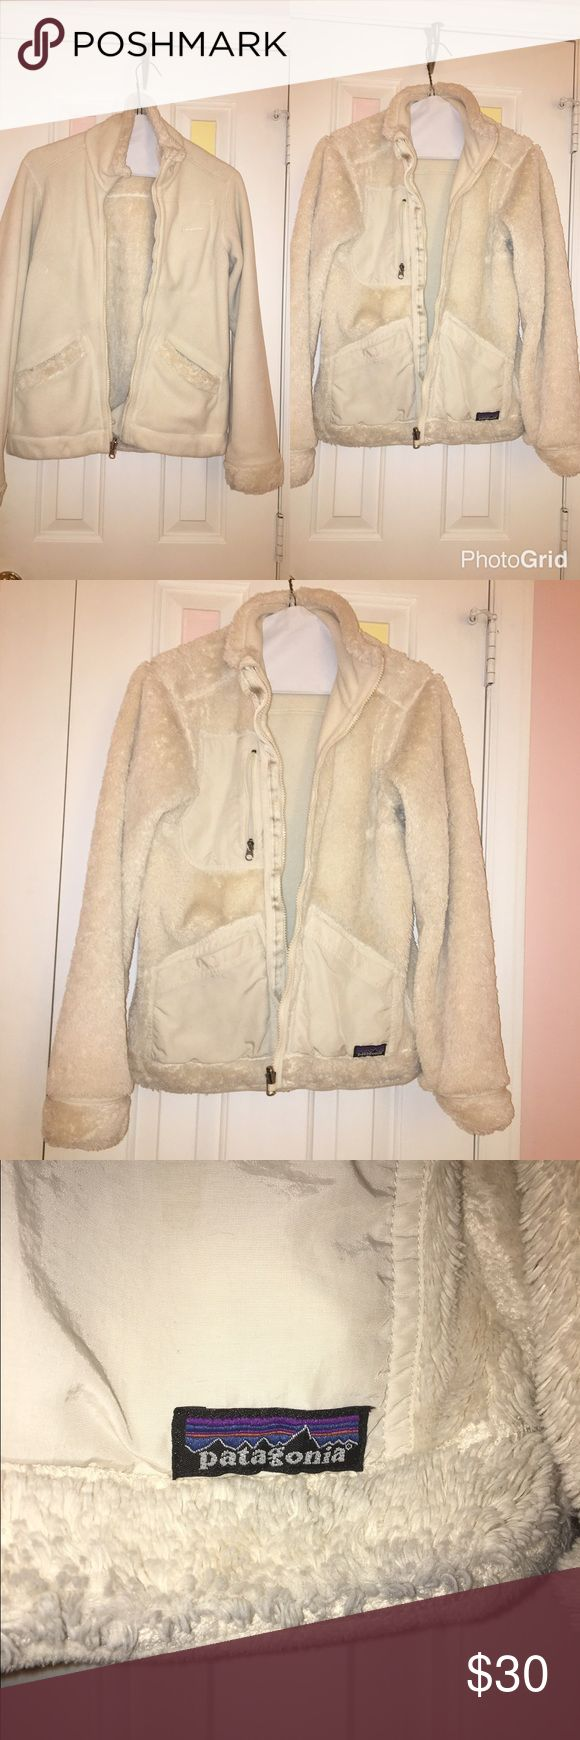 Reversible Patagonia Fleece Jacket (zip up) Reversible Patagonia jacket; gently used, size small, zip up, fleece material. Fleece side and fur side. Patagonia Jackets & Coats